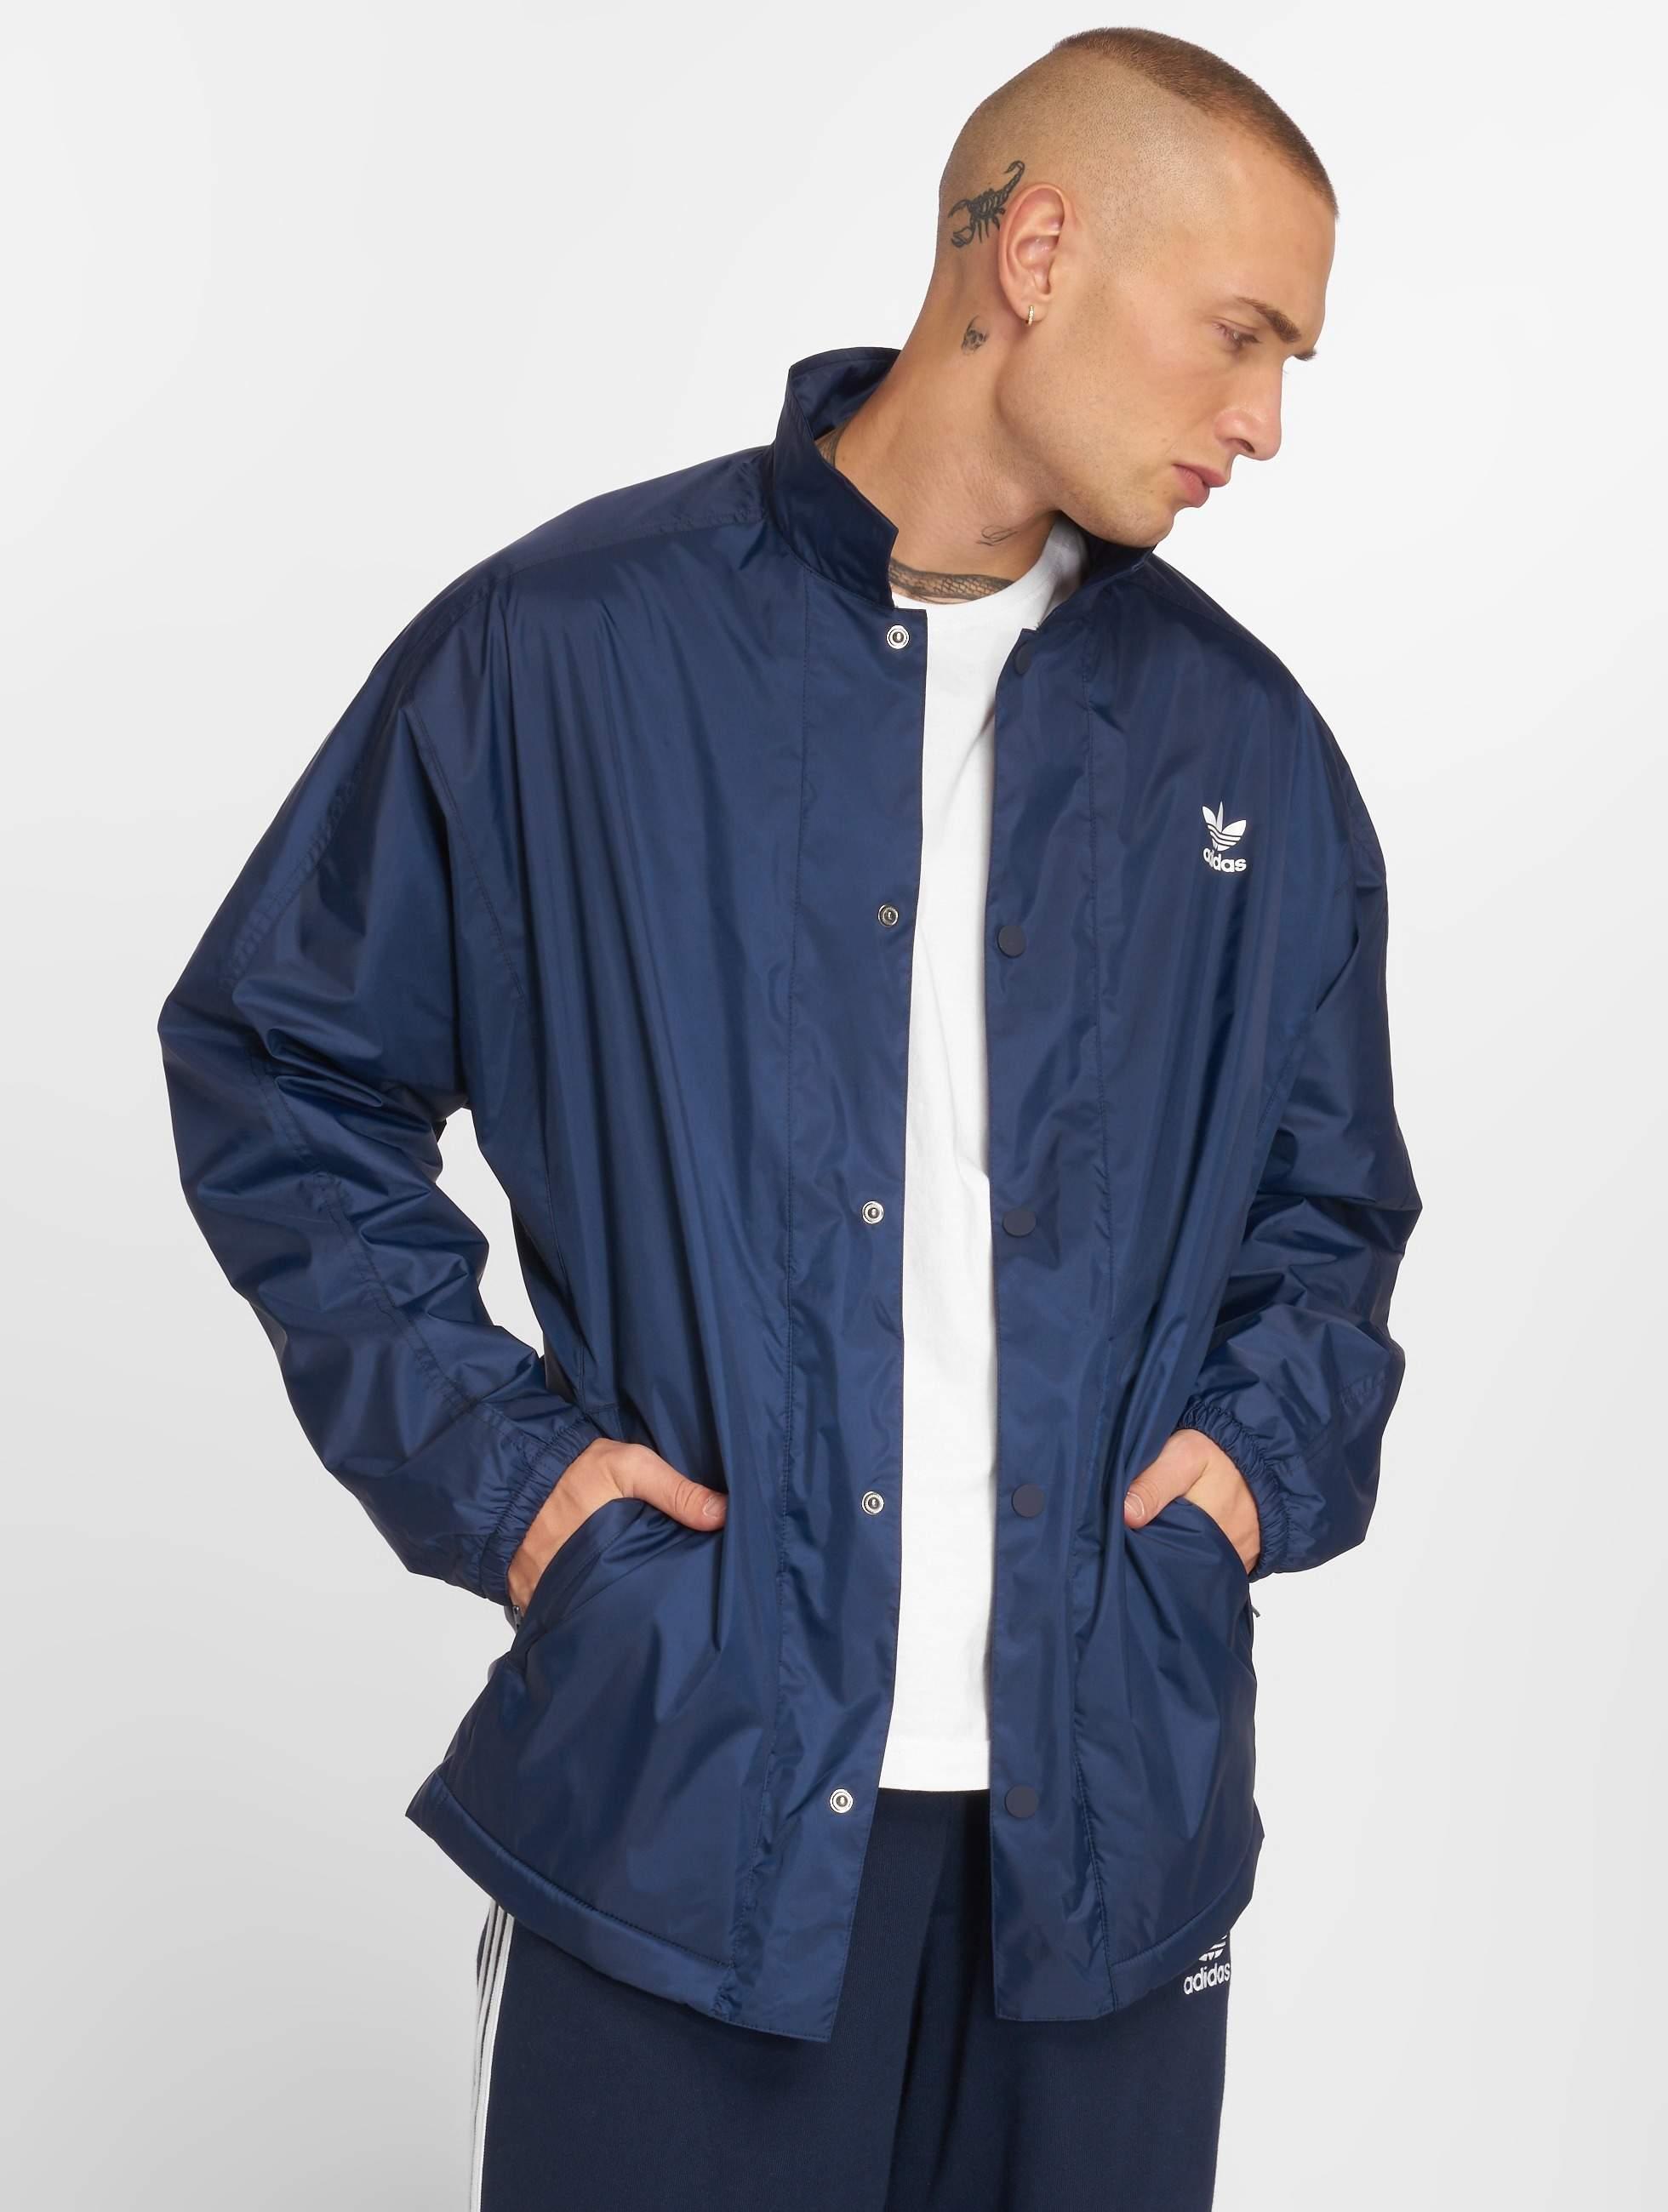 Adidas Originals Wntr Coach Jckt Transition Jacket Collegiate Navy